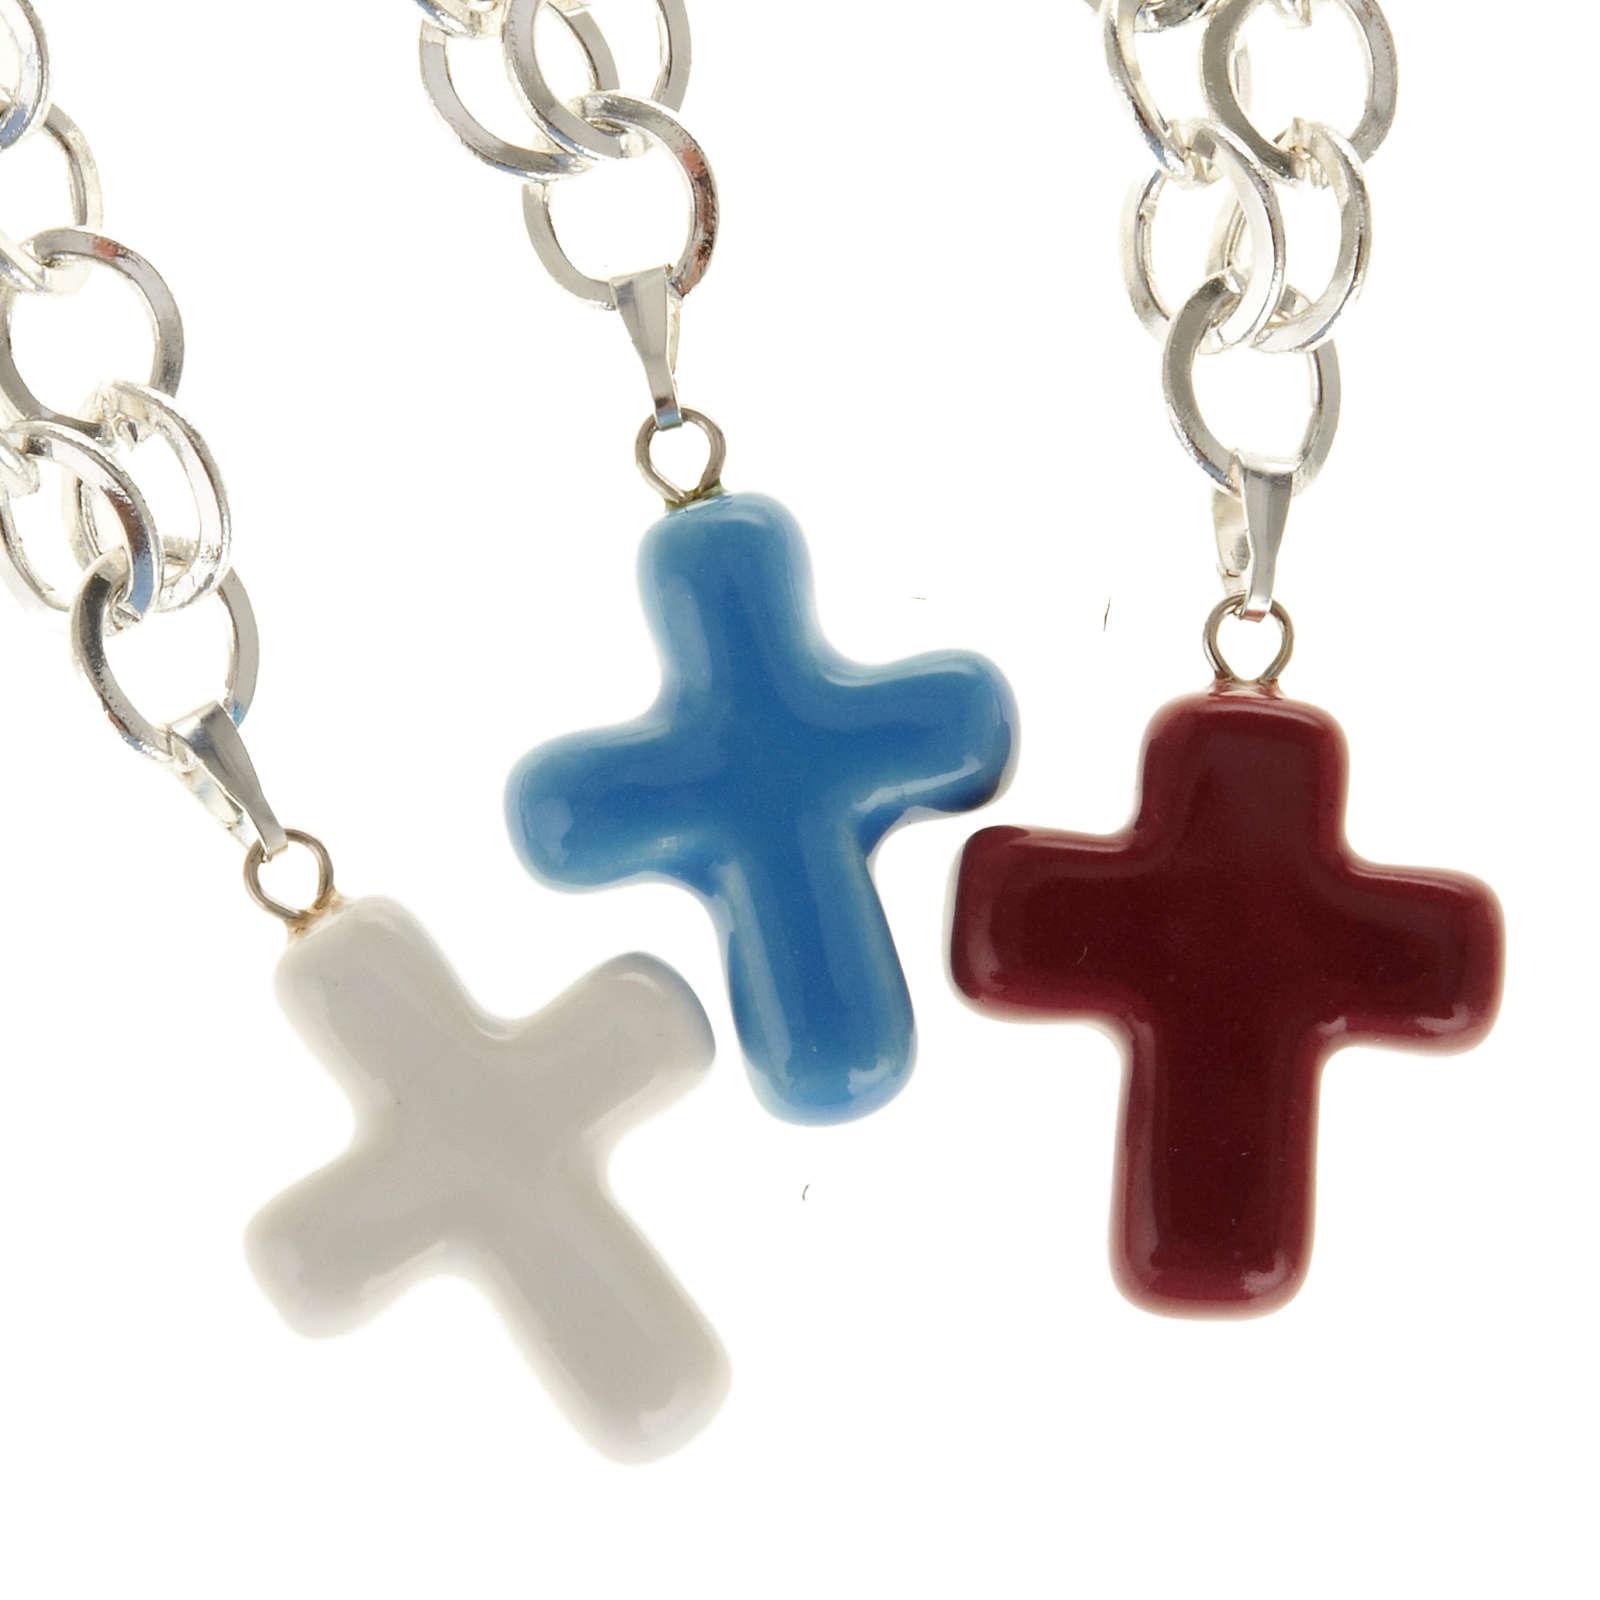 Brazalete de metal y cruz en cerámica 4